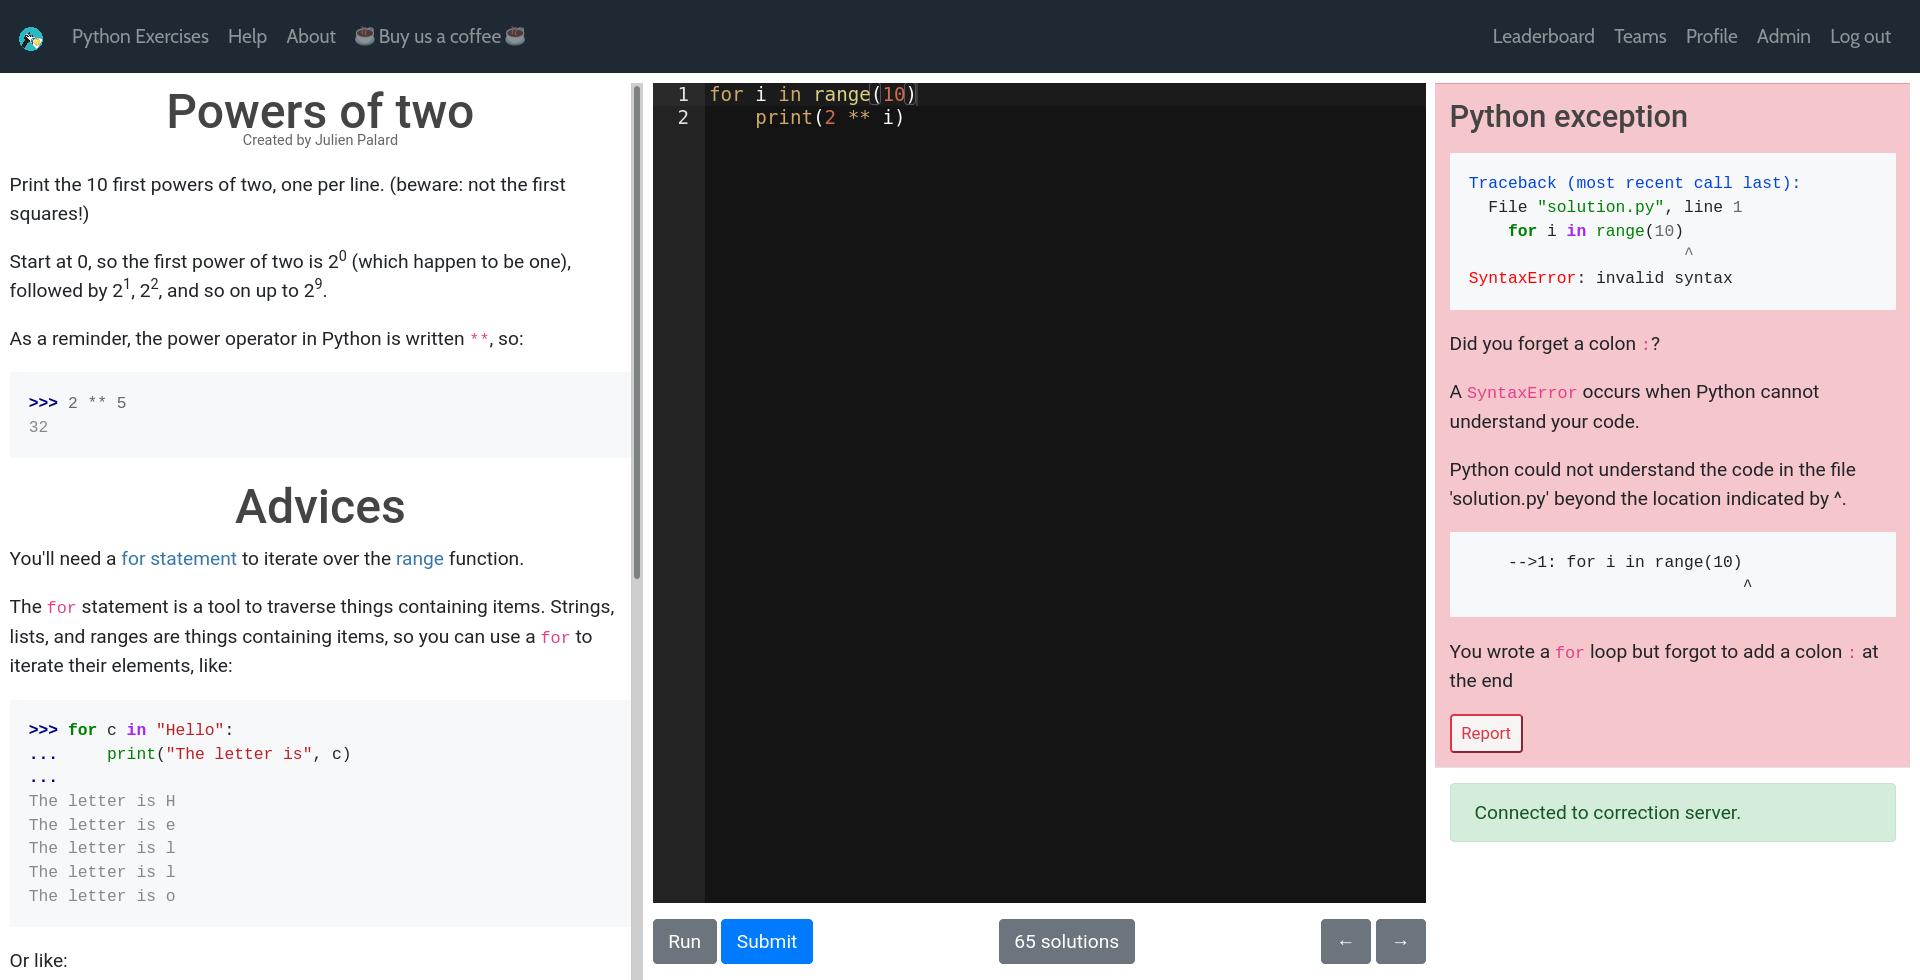 HackInScience screenshot